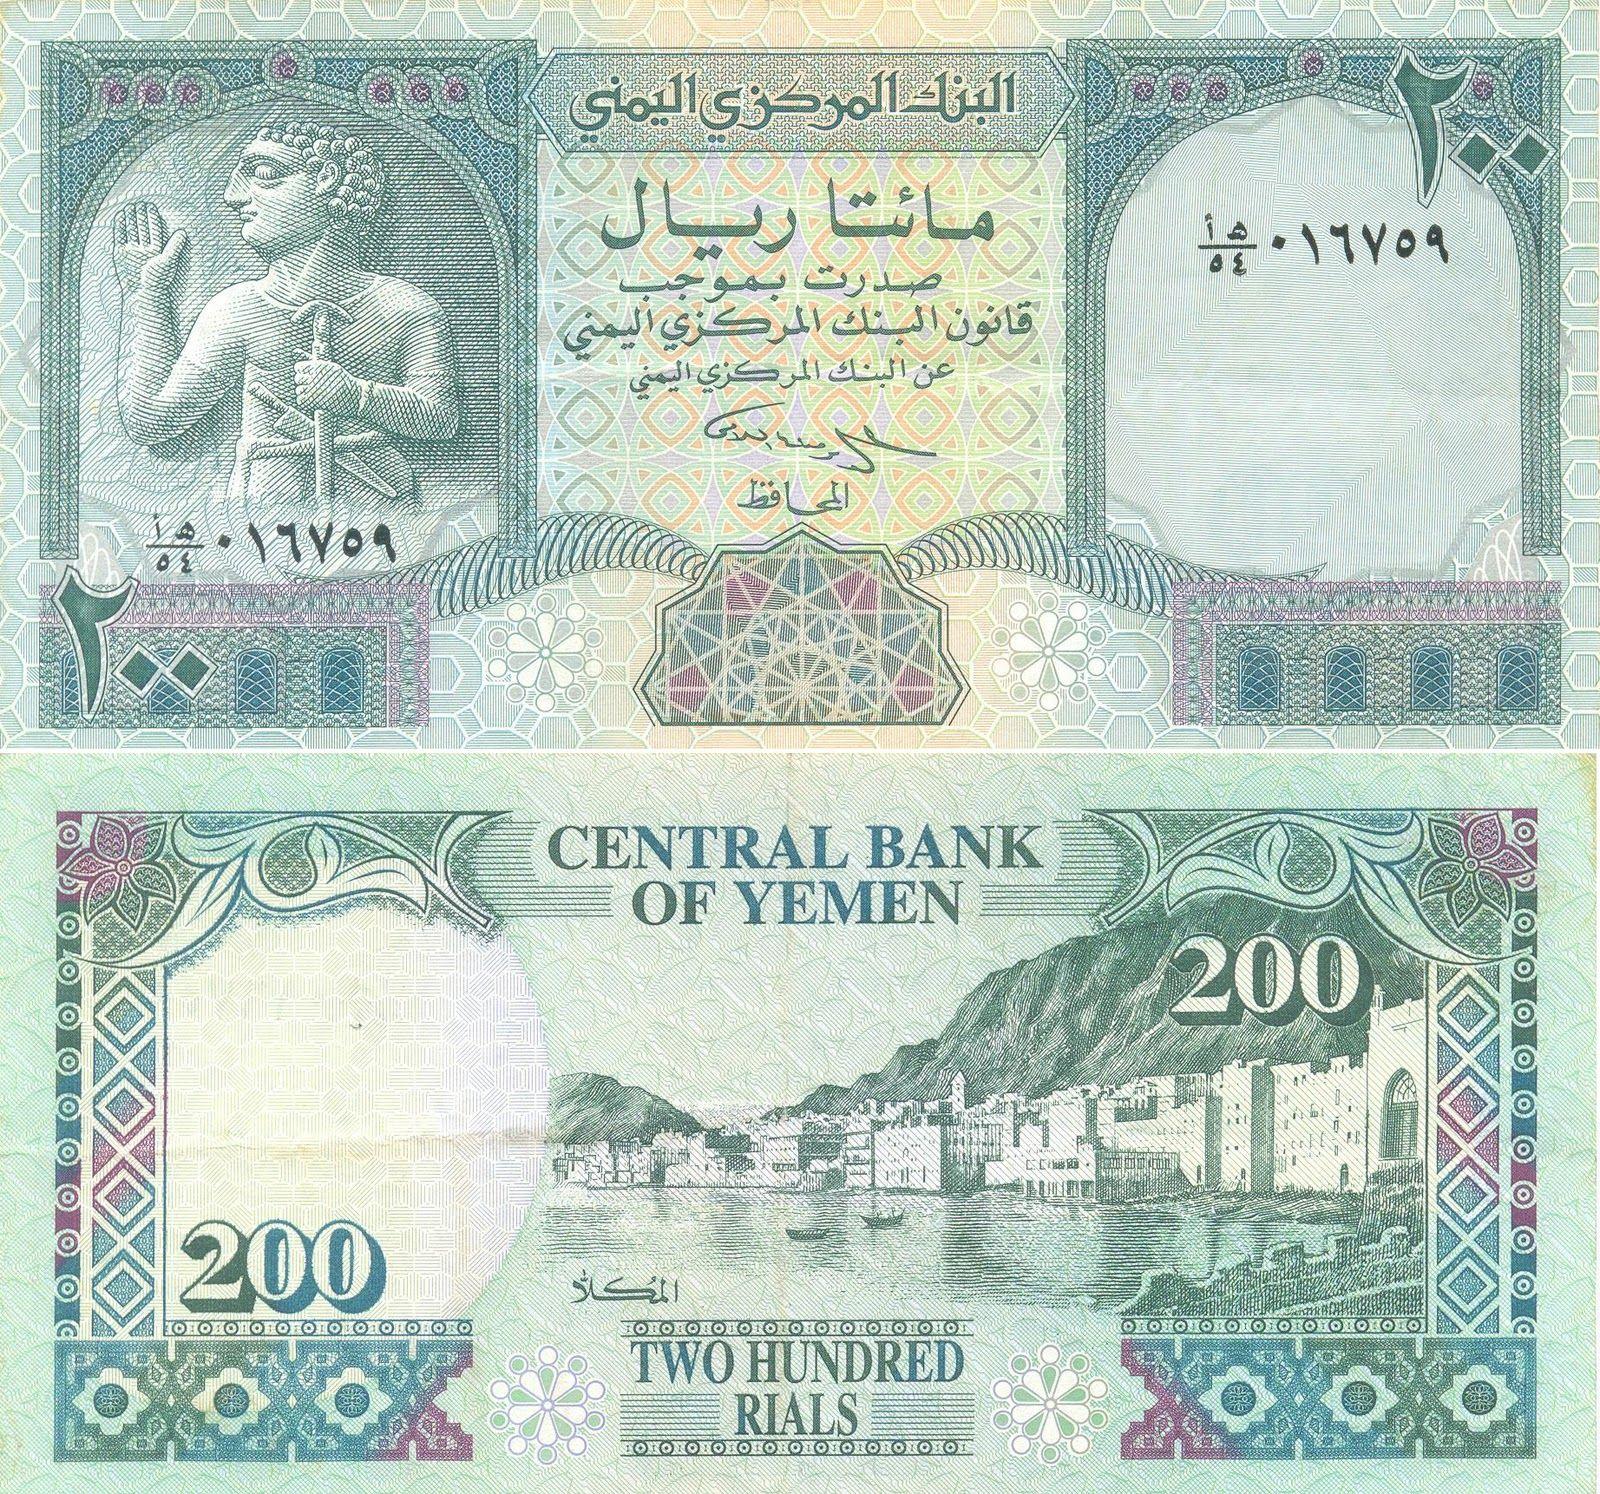 bank of america coin deposit